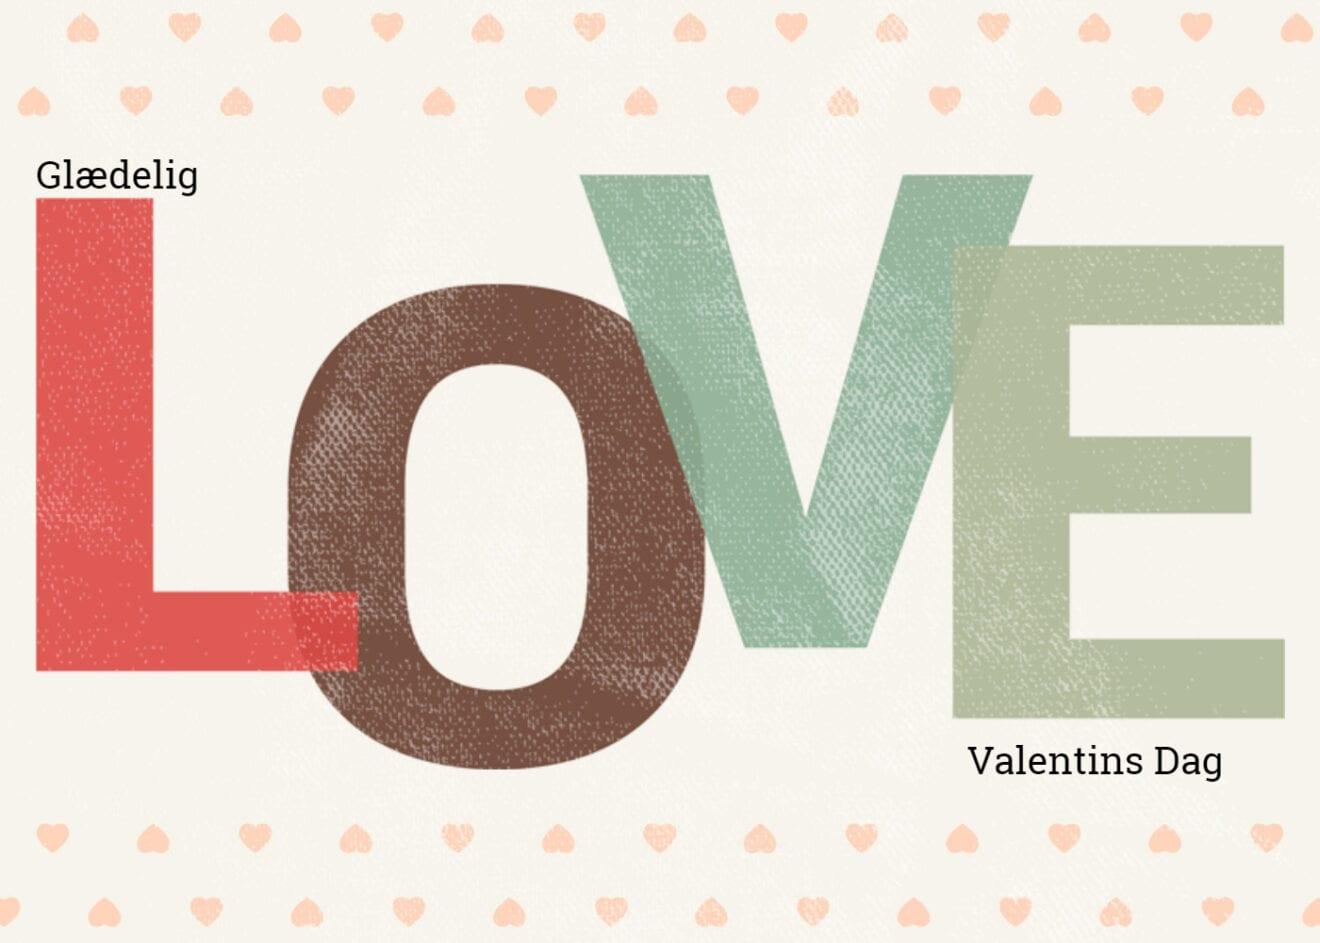 Husk valentines dag på søndag